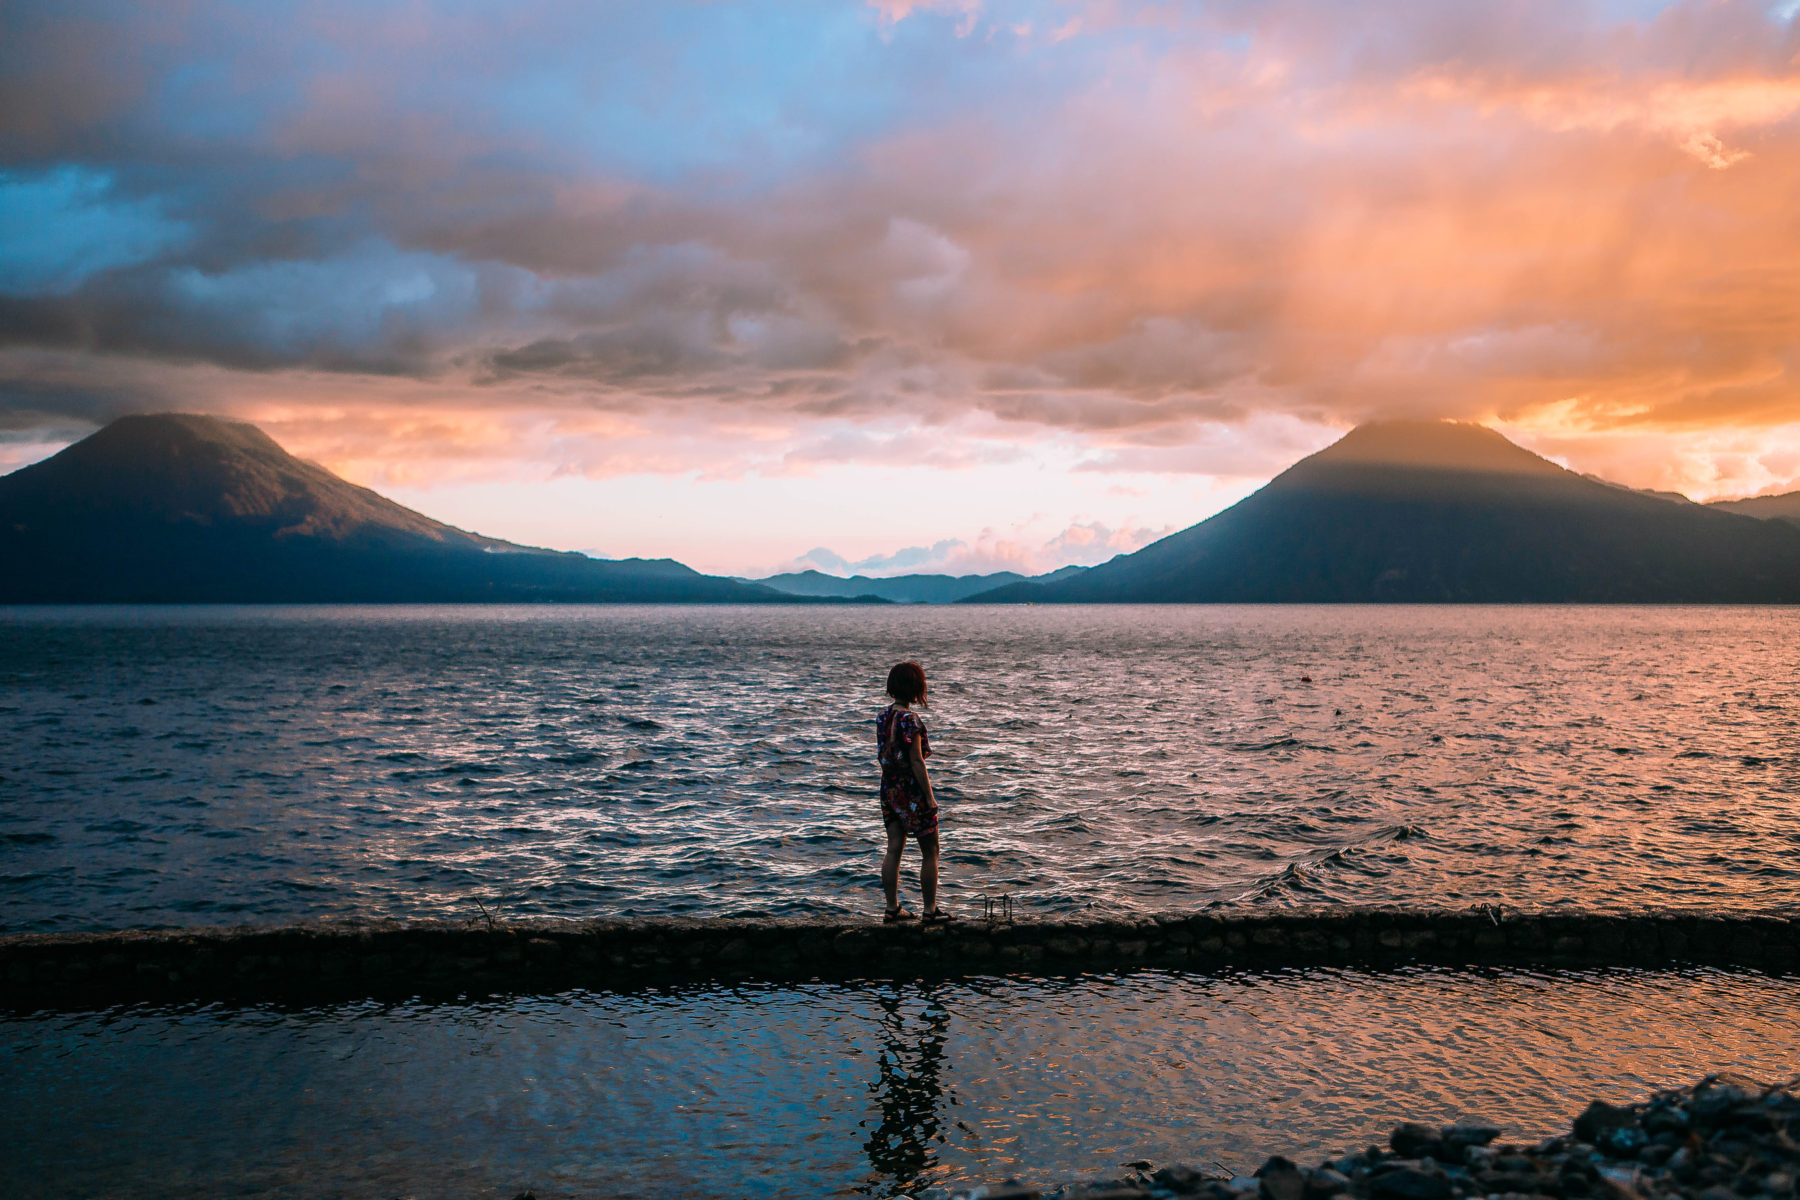 guatemala lake atitlan lago central america most beautiful lake in the world volcanoes sky on fire sunset